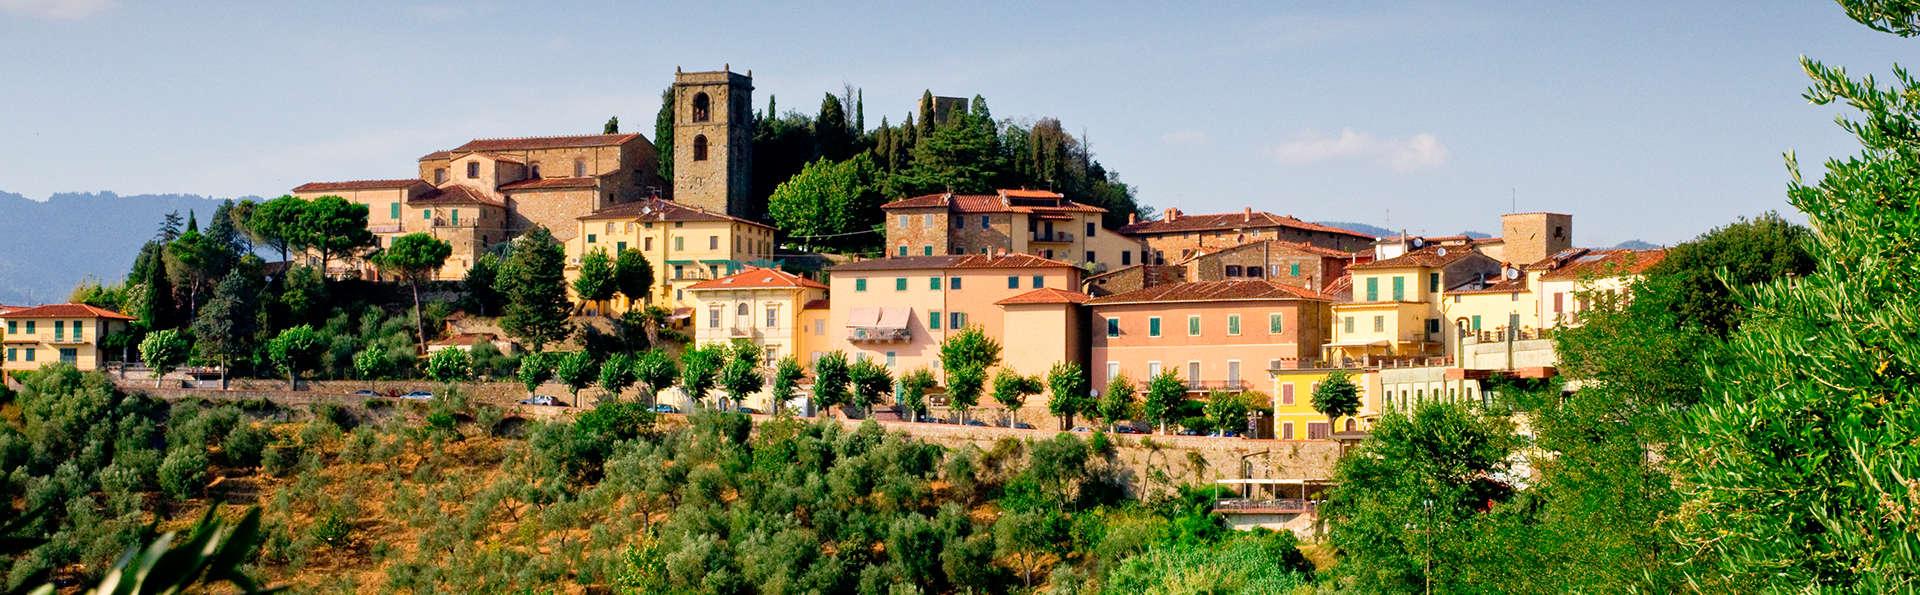 Hotel Mediterraneo - EDIT_montecatini_alta.jpg